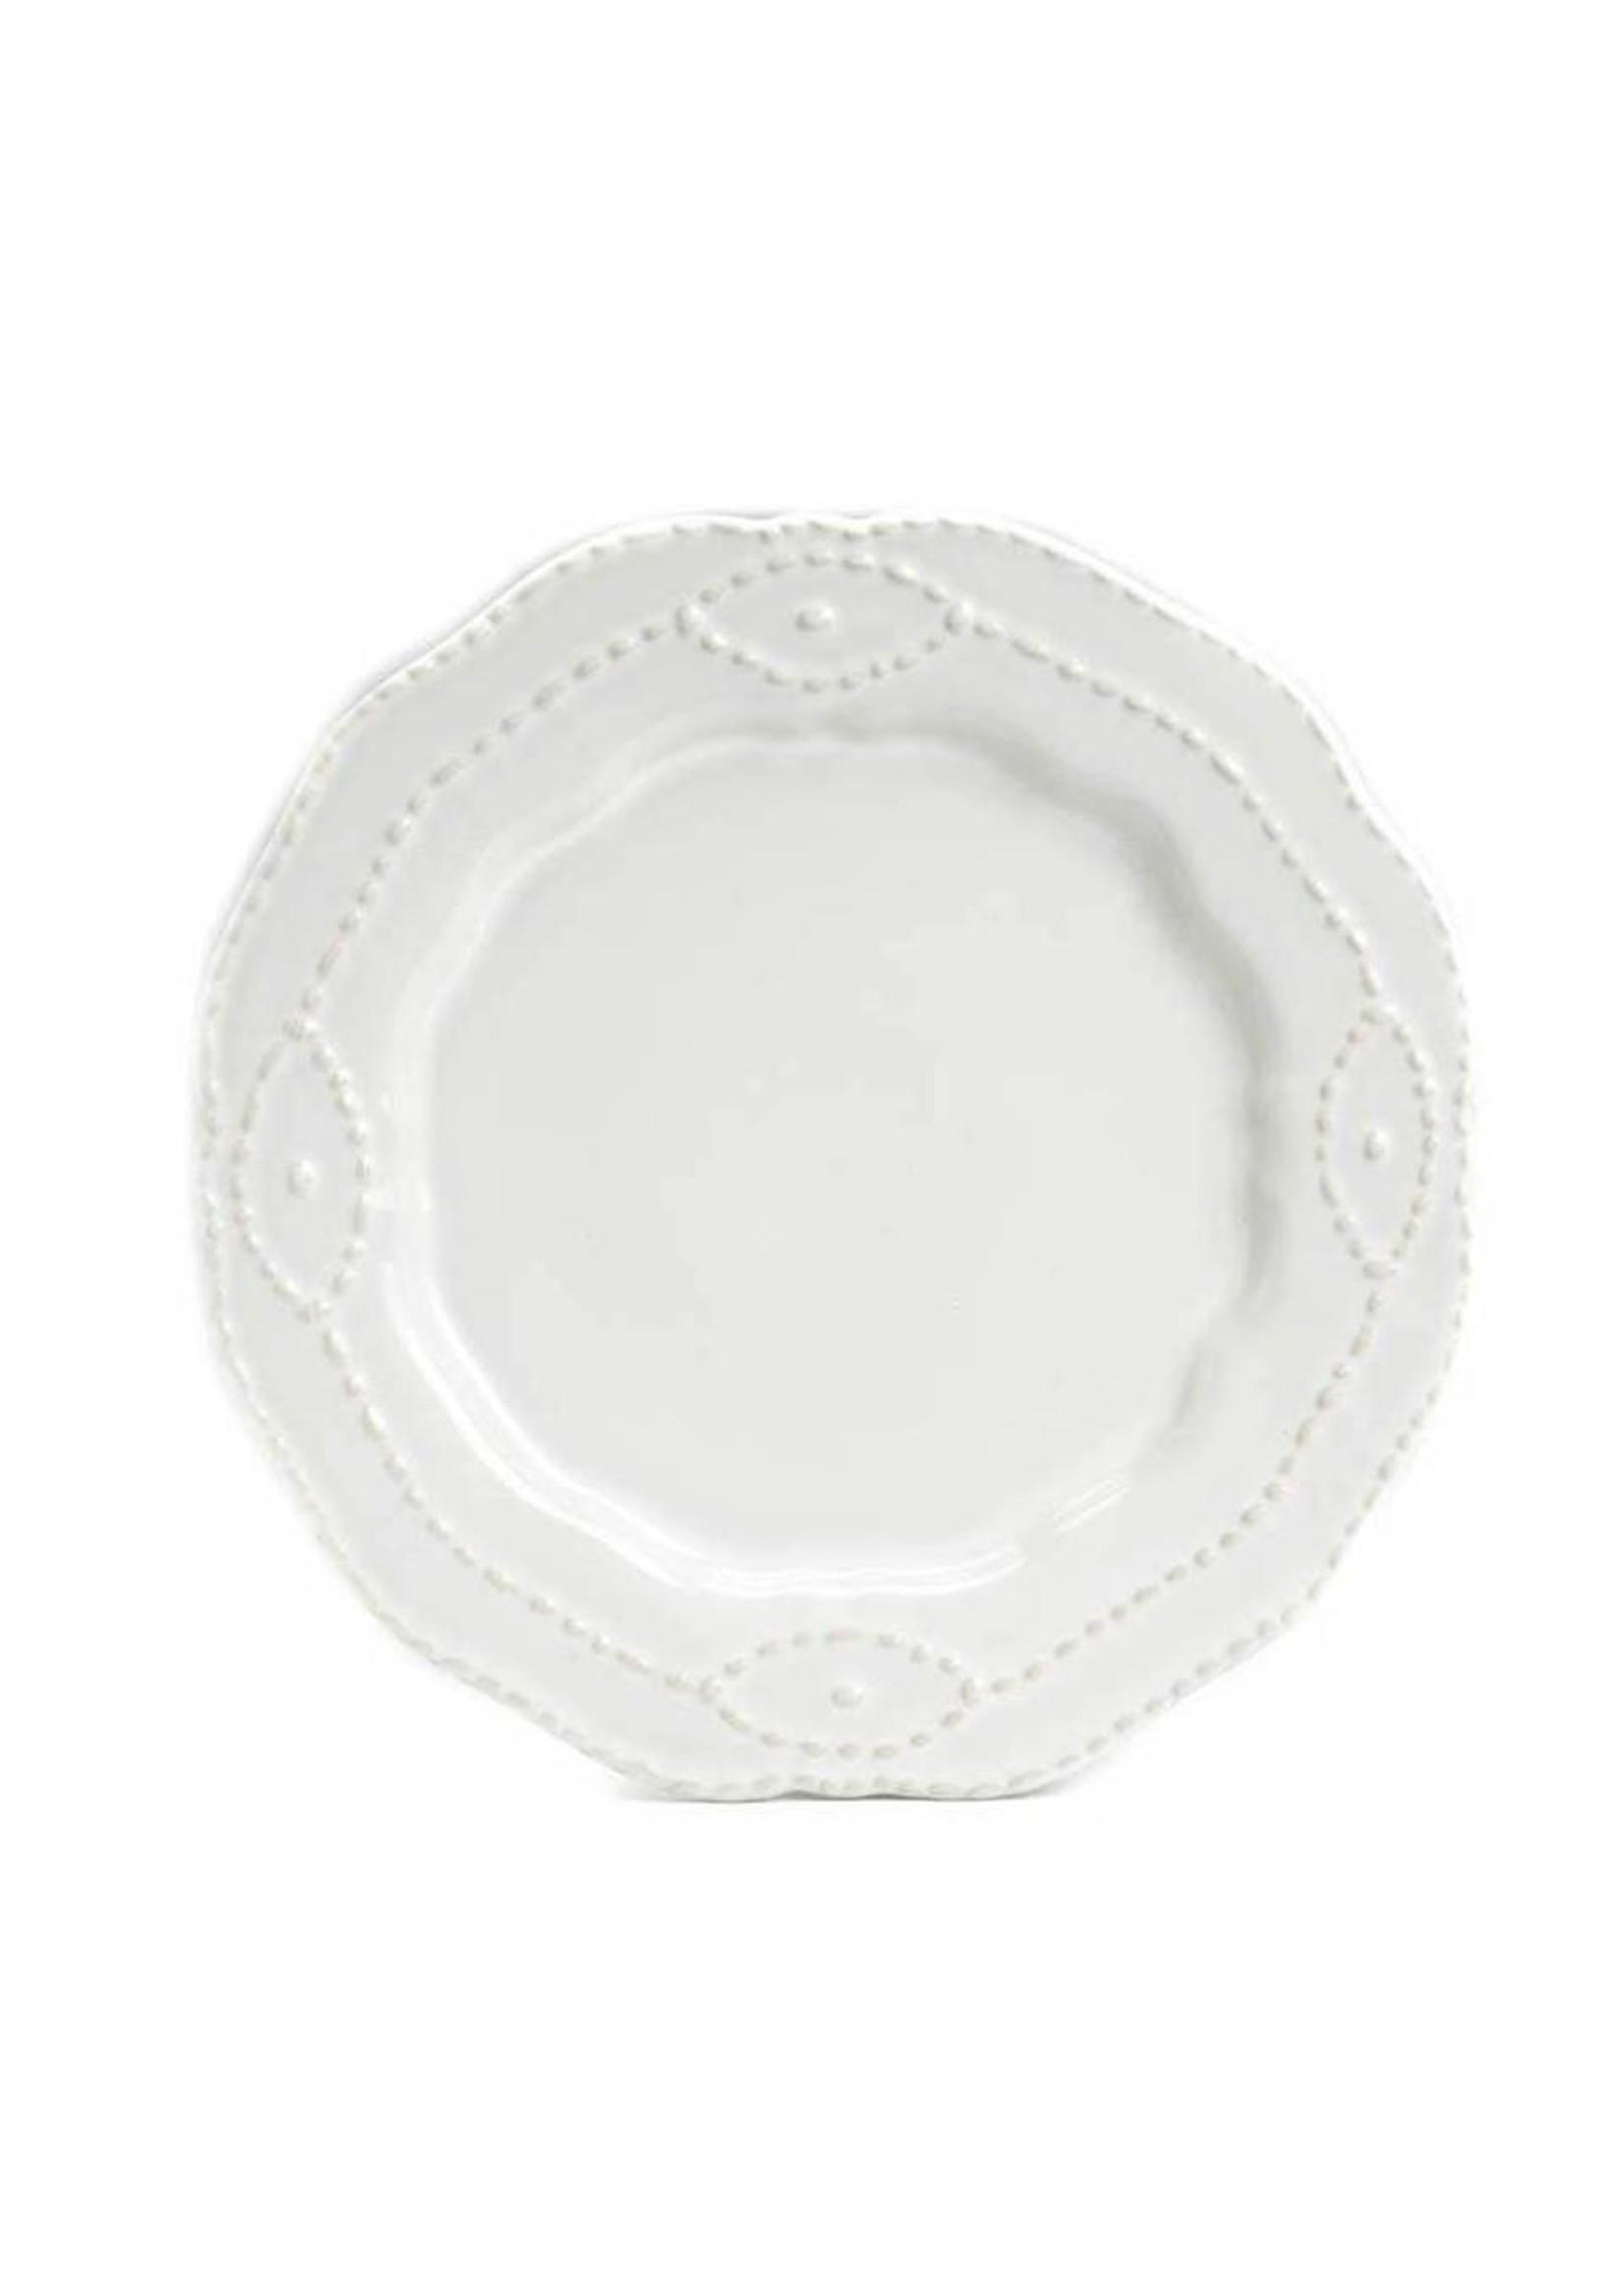 Skyros Legado Dinner - White